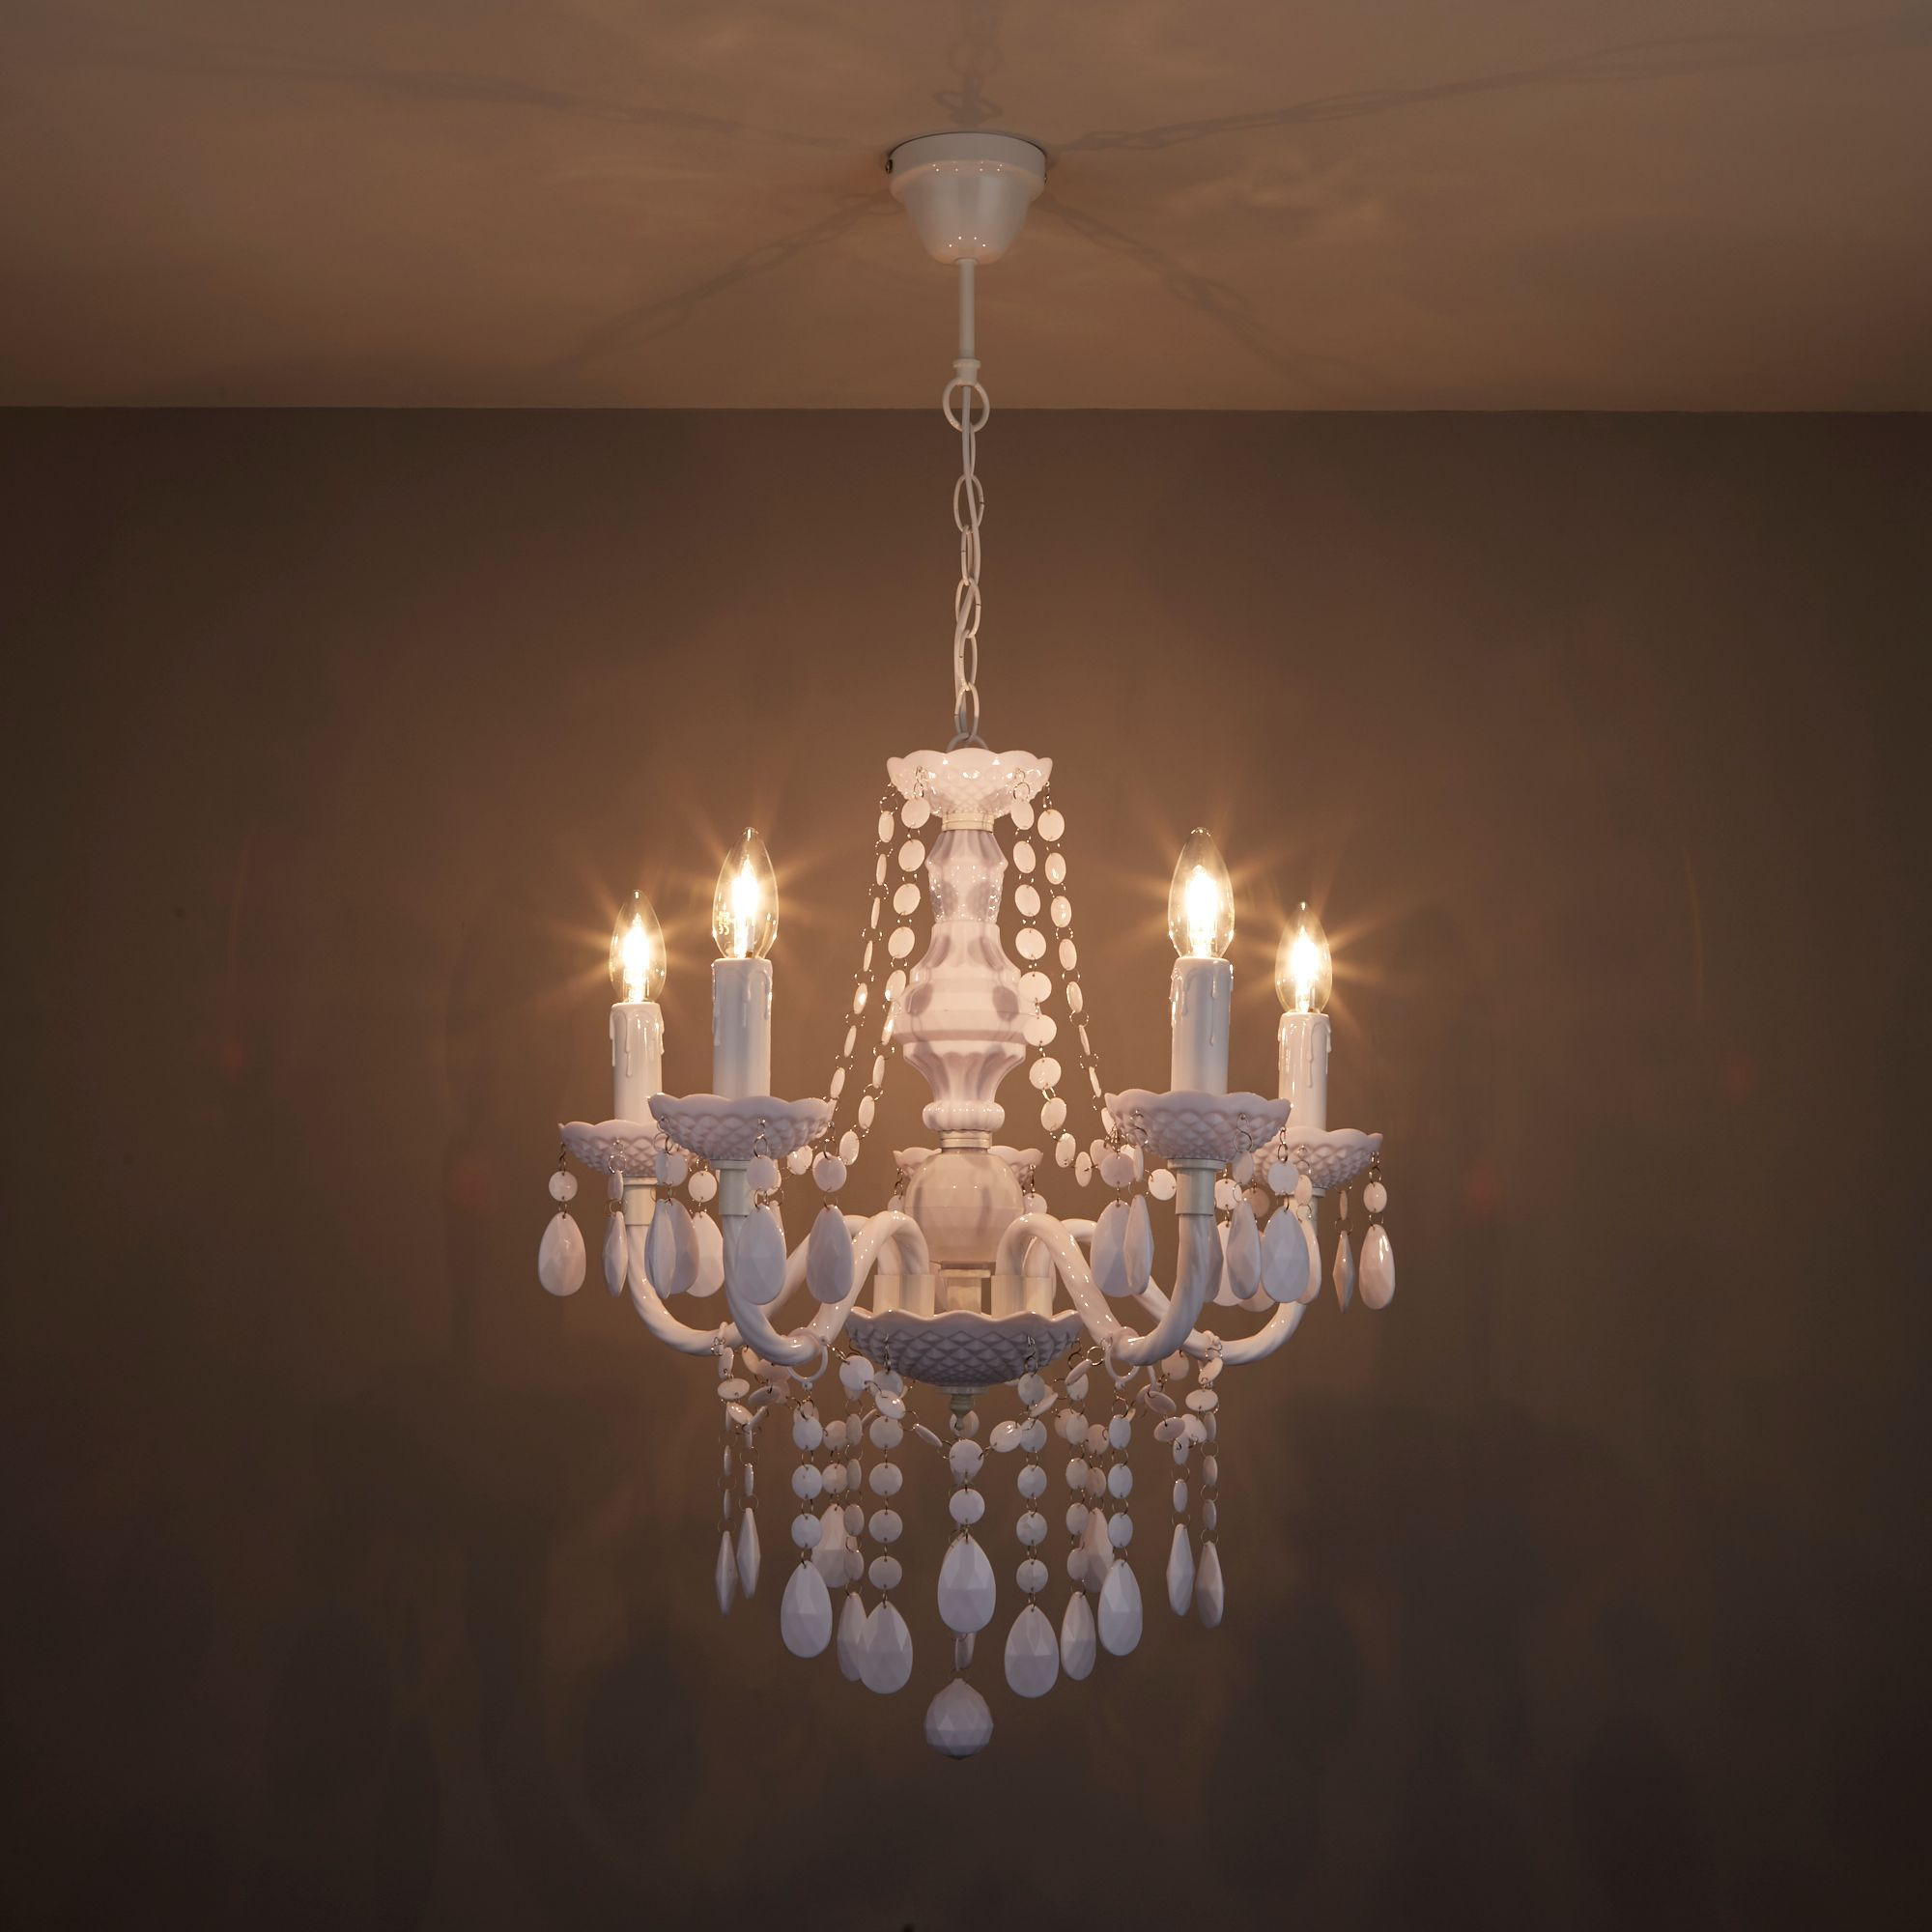 Wickham White 5 Lamp Pendant Ceiling Light | Departments | DIY at B&Q